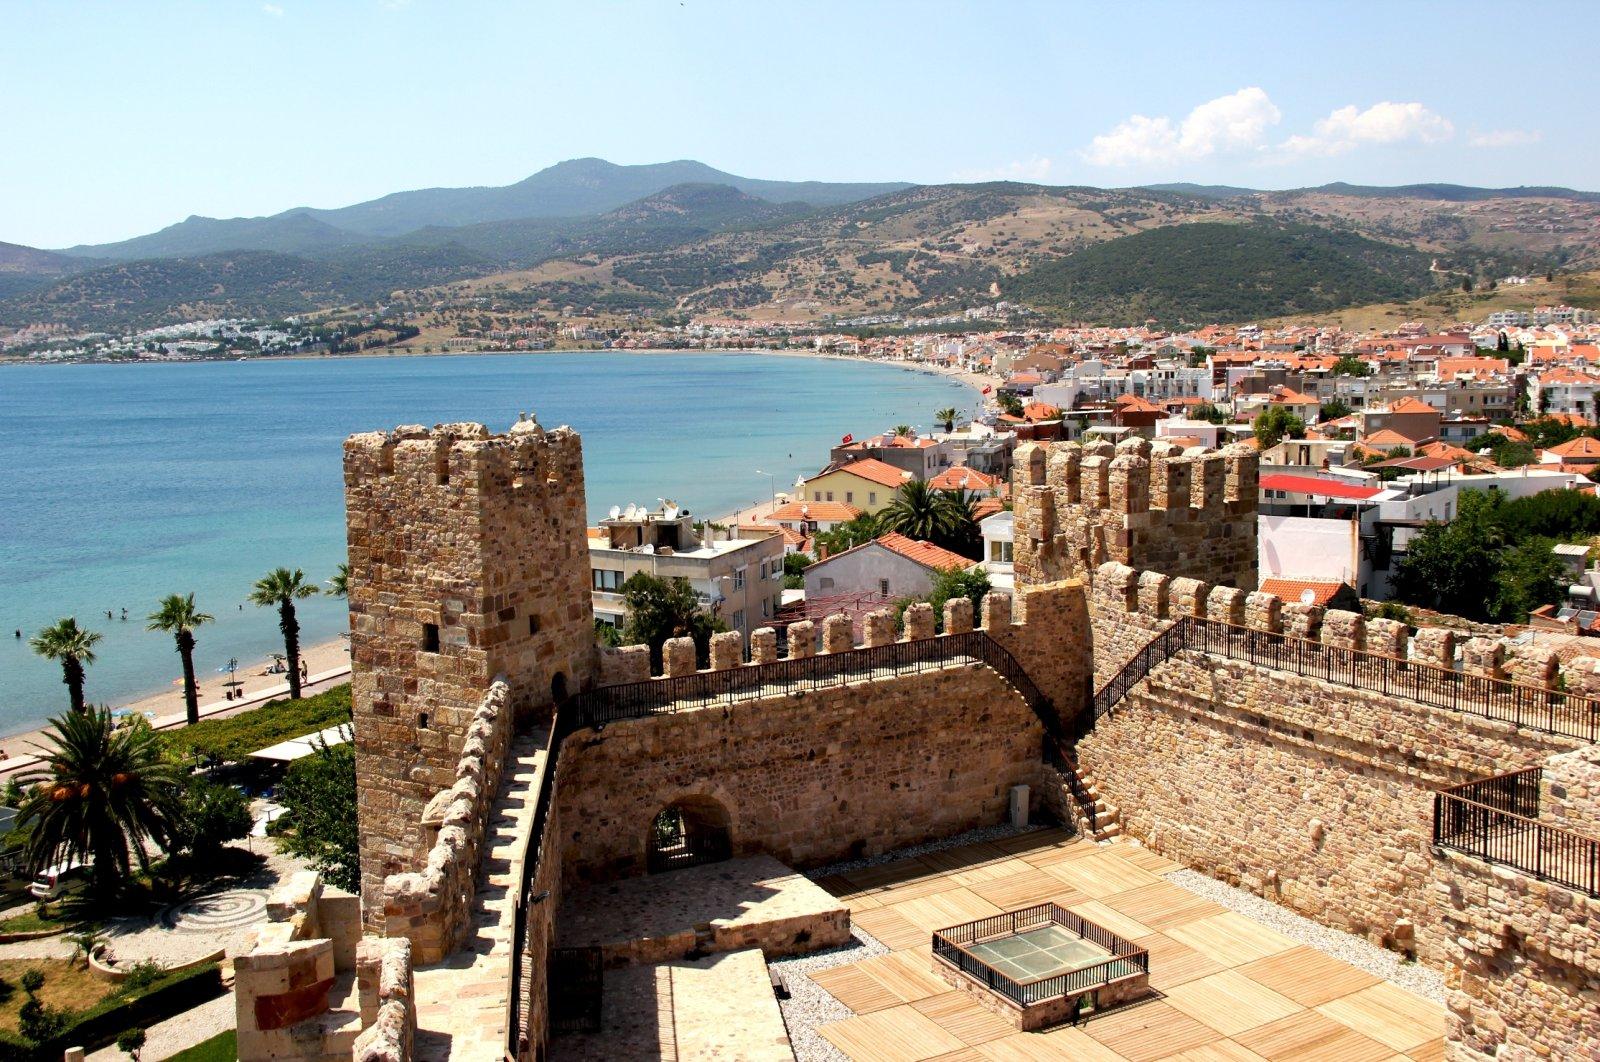 Çandarlı Castle still stands today in all its glory in Izmir.